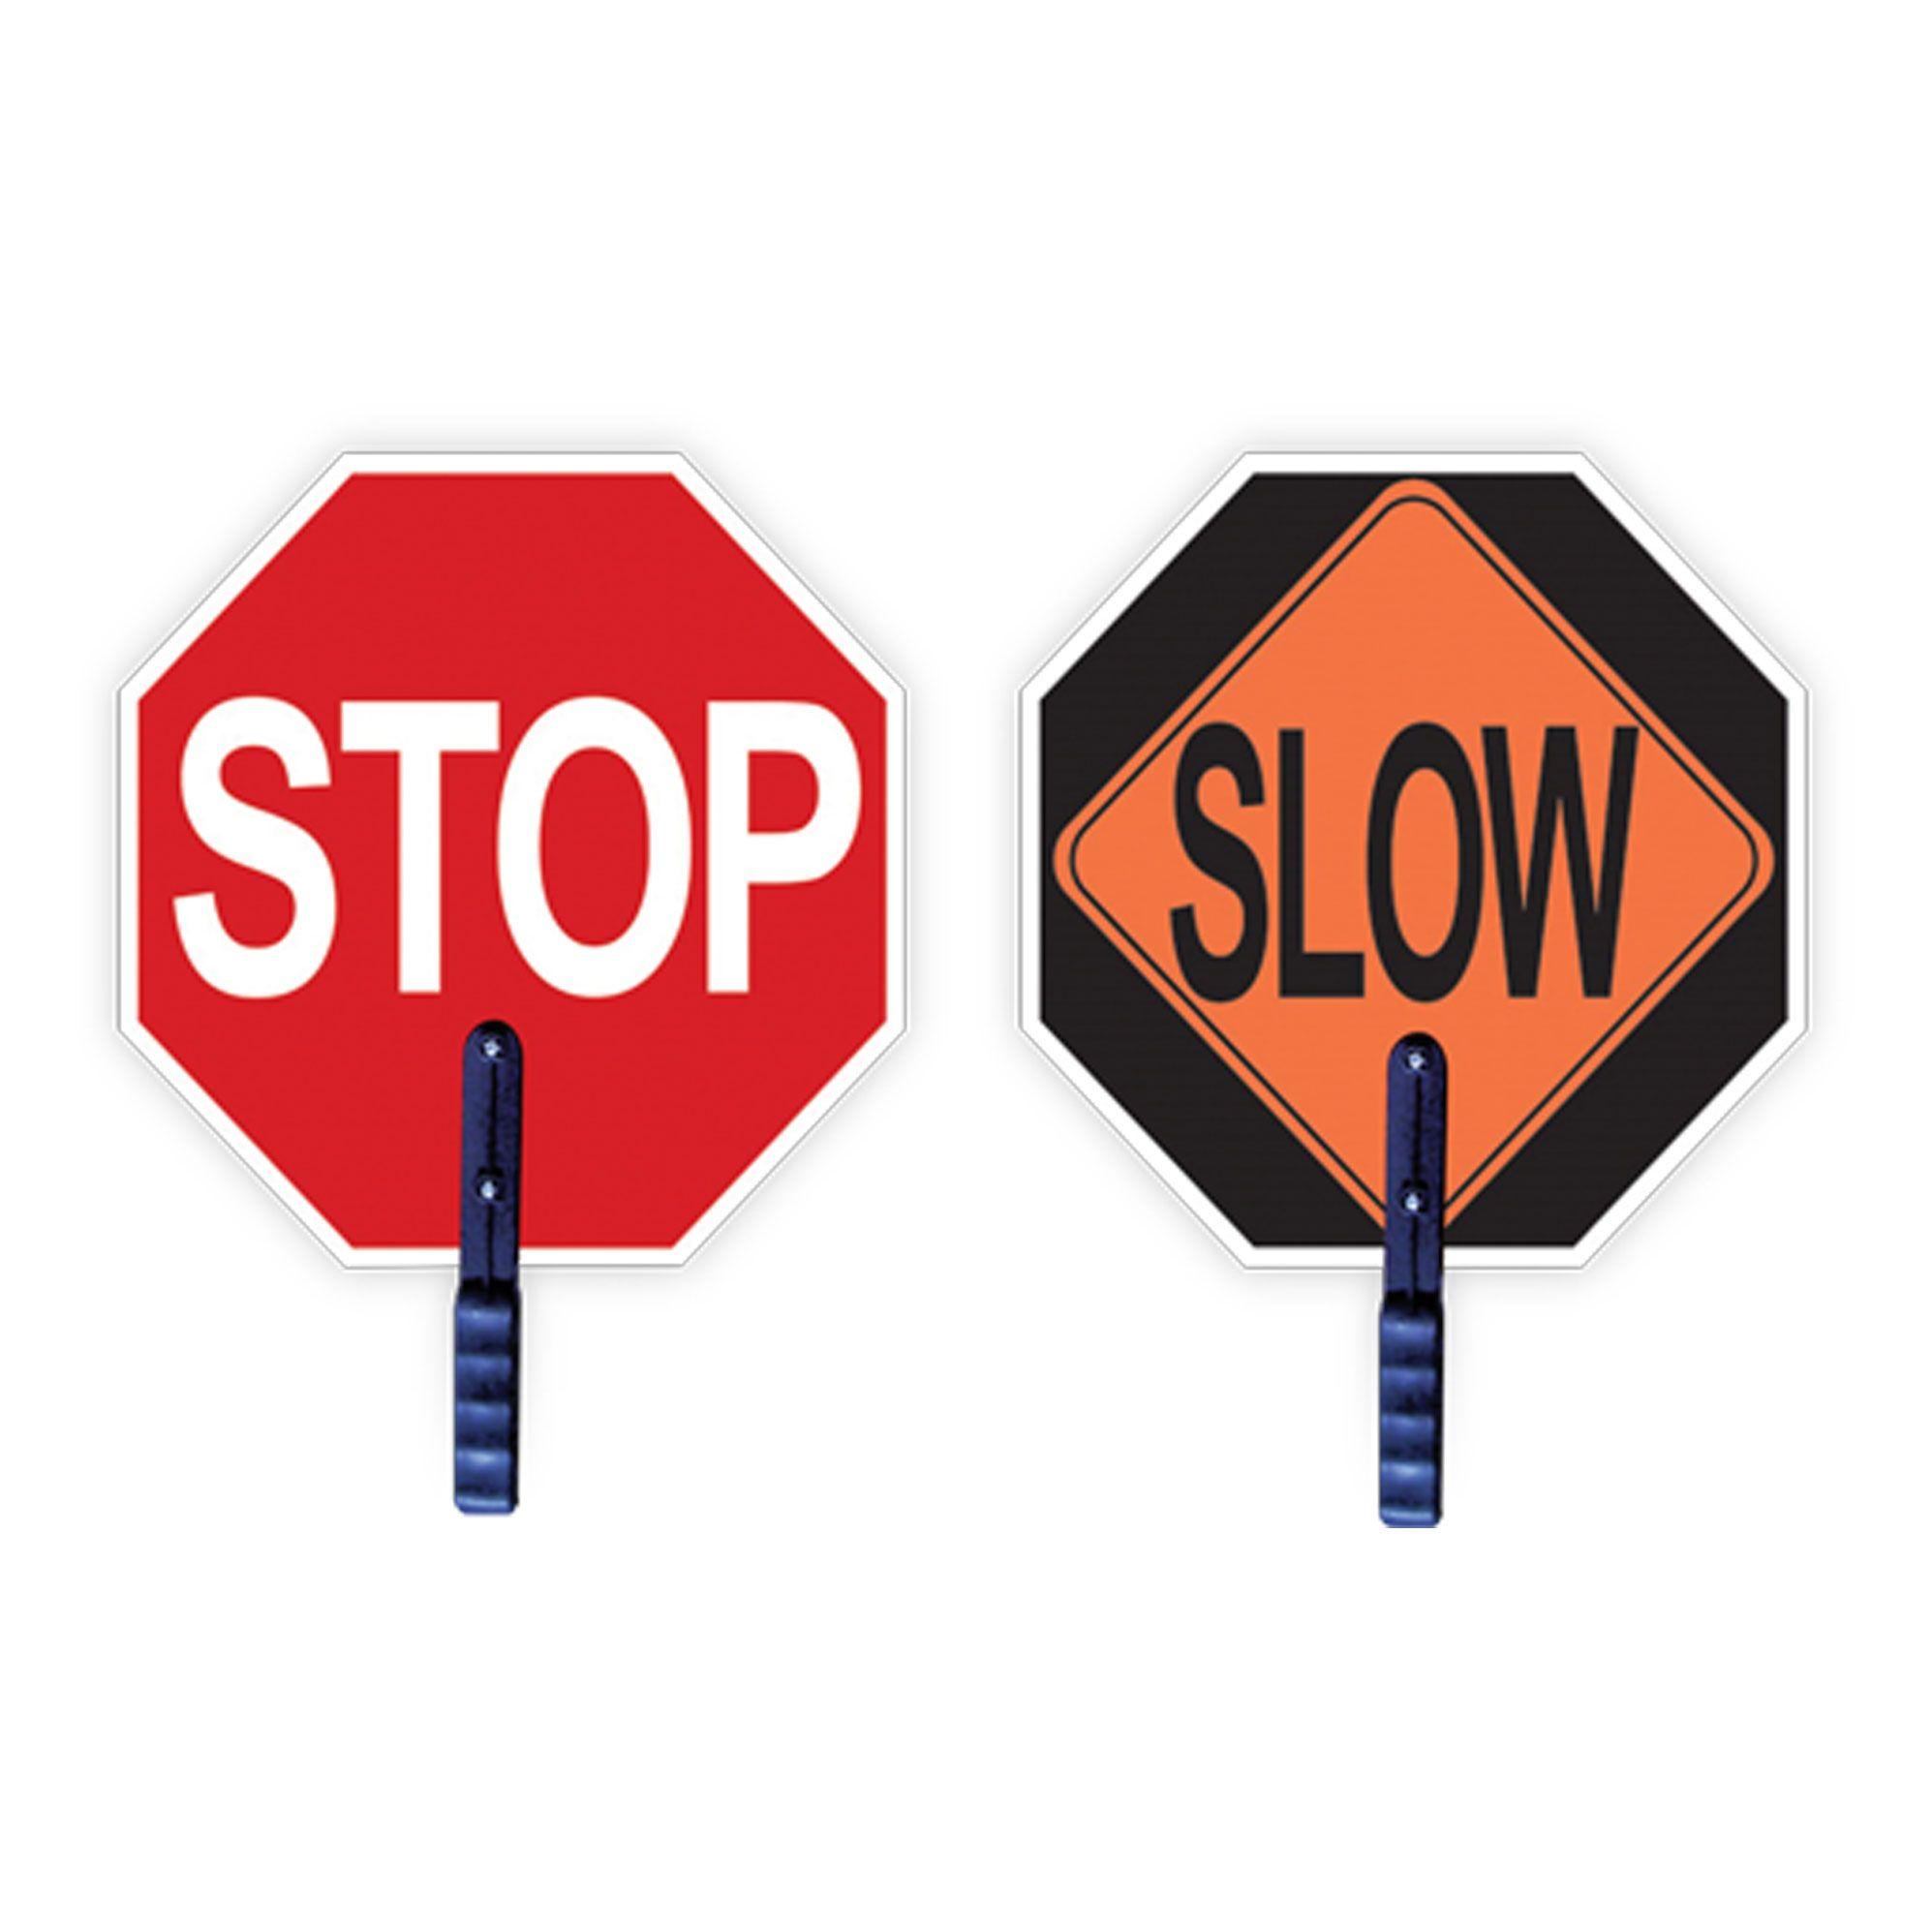 Engineering Grade Traffic Safety Paddle - Stop/Slow-2W International